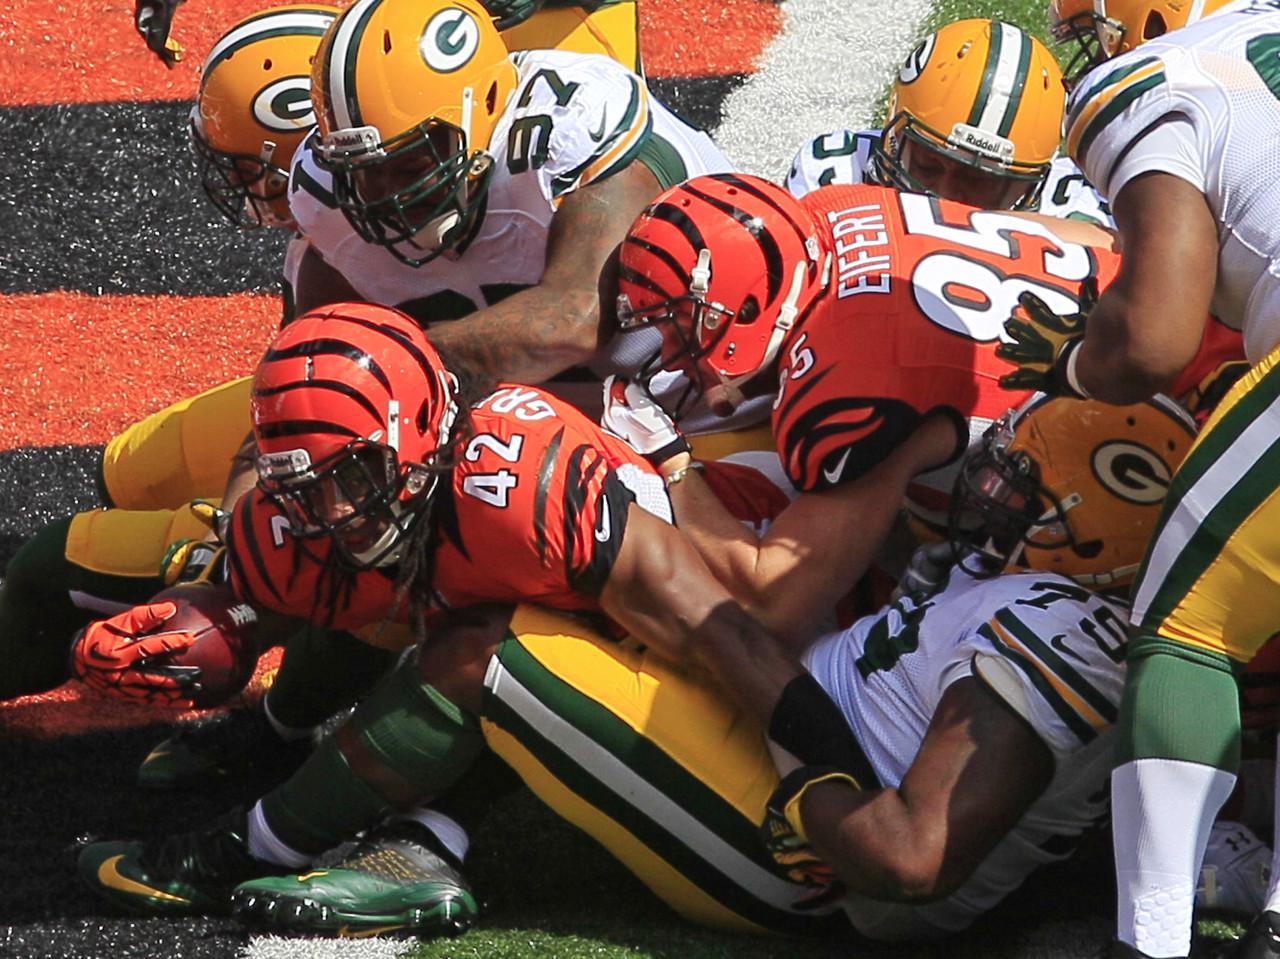 [NFL] Week 3: Cincinnati Bengals vs Green Bay Packers 34-30